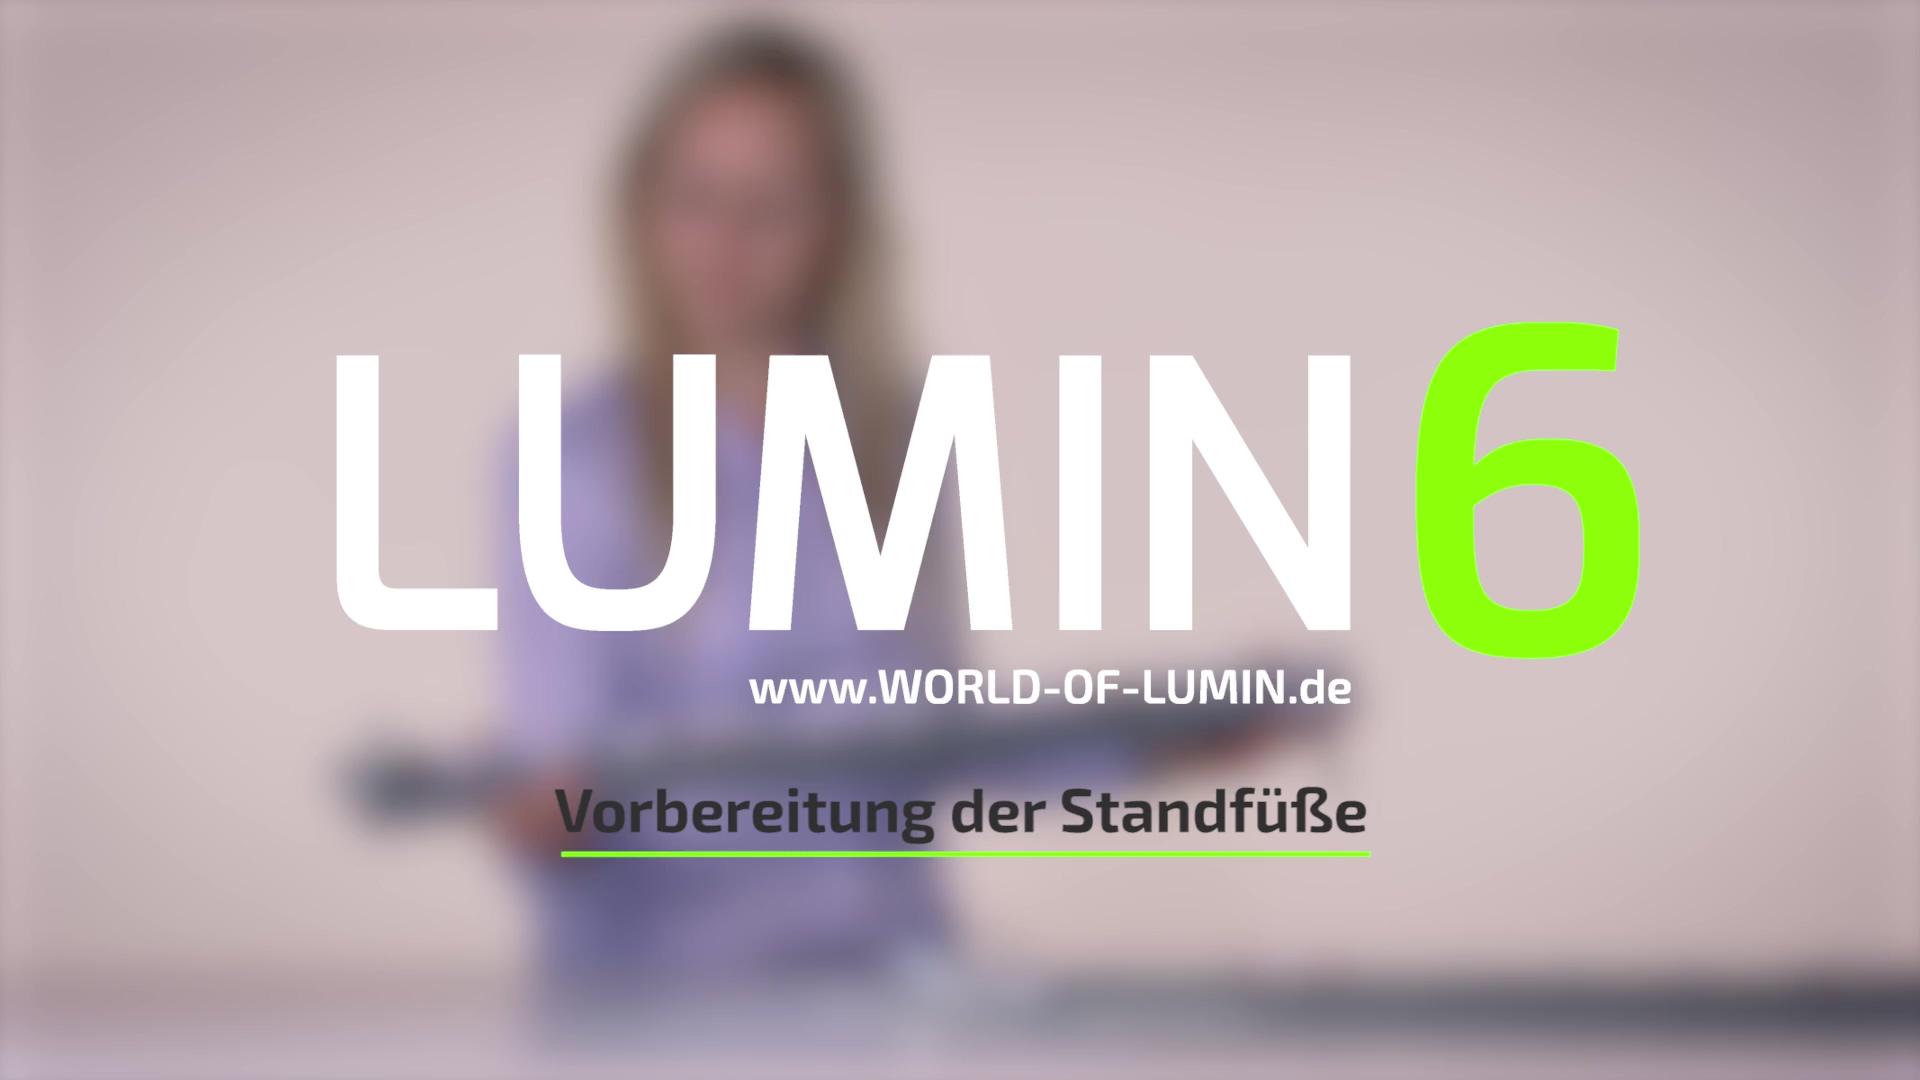 LaConcept_Lumin6_QR_Standfüße